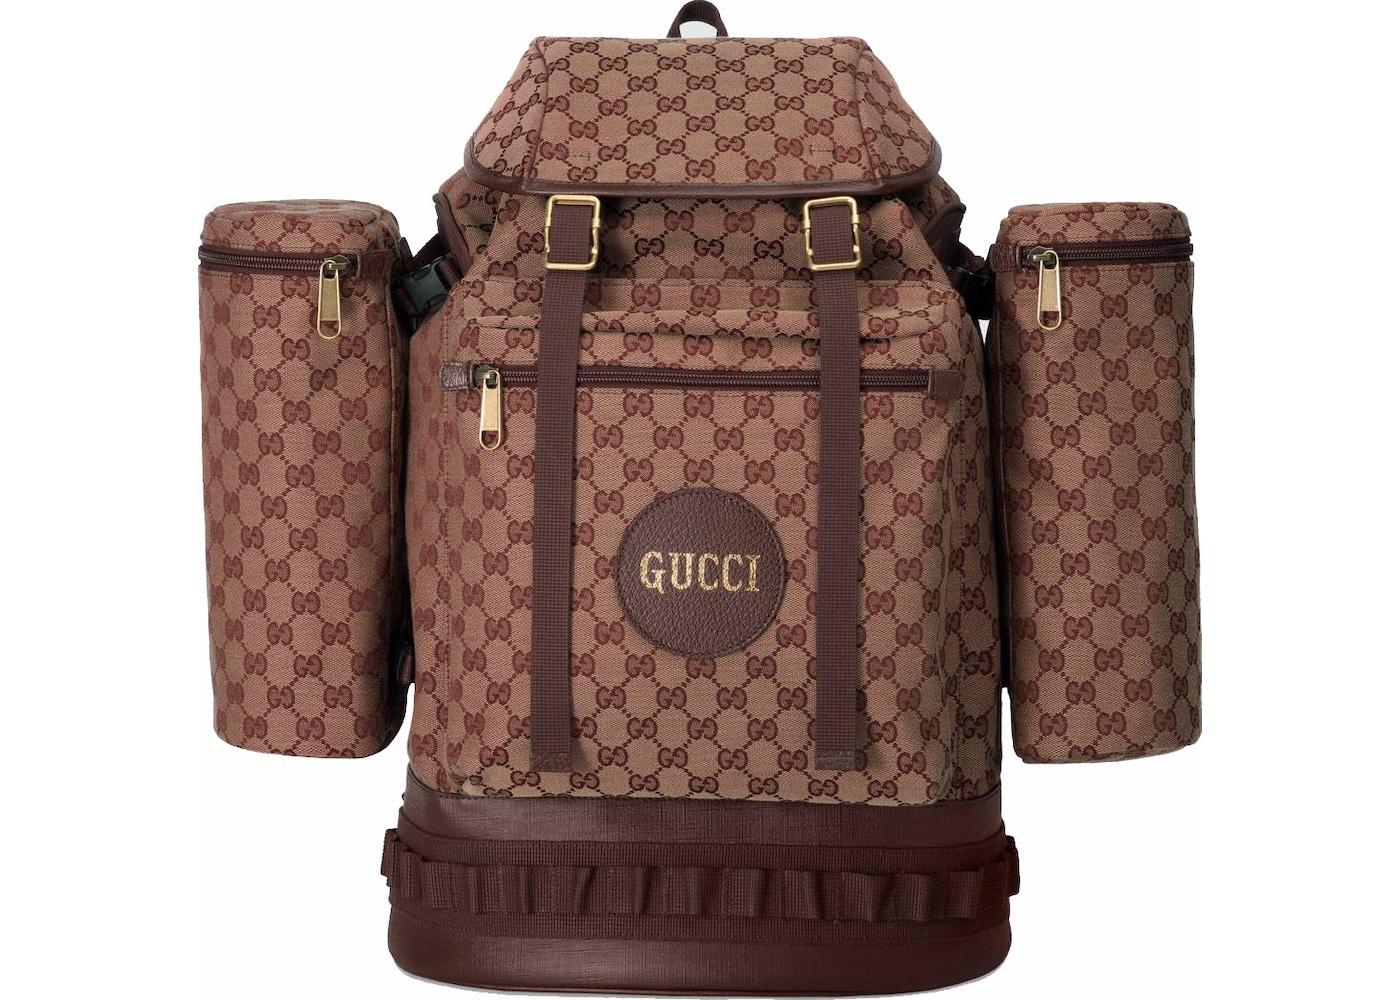 a0a811866ad43e Gucci Backpack Canvas Large Beige/Bordeaux